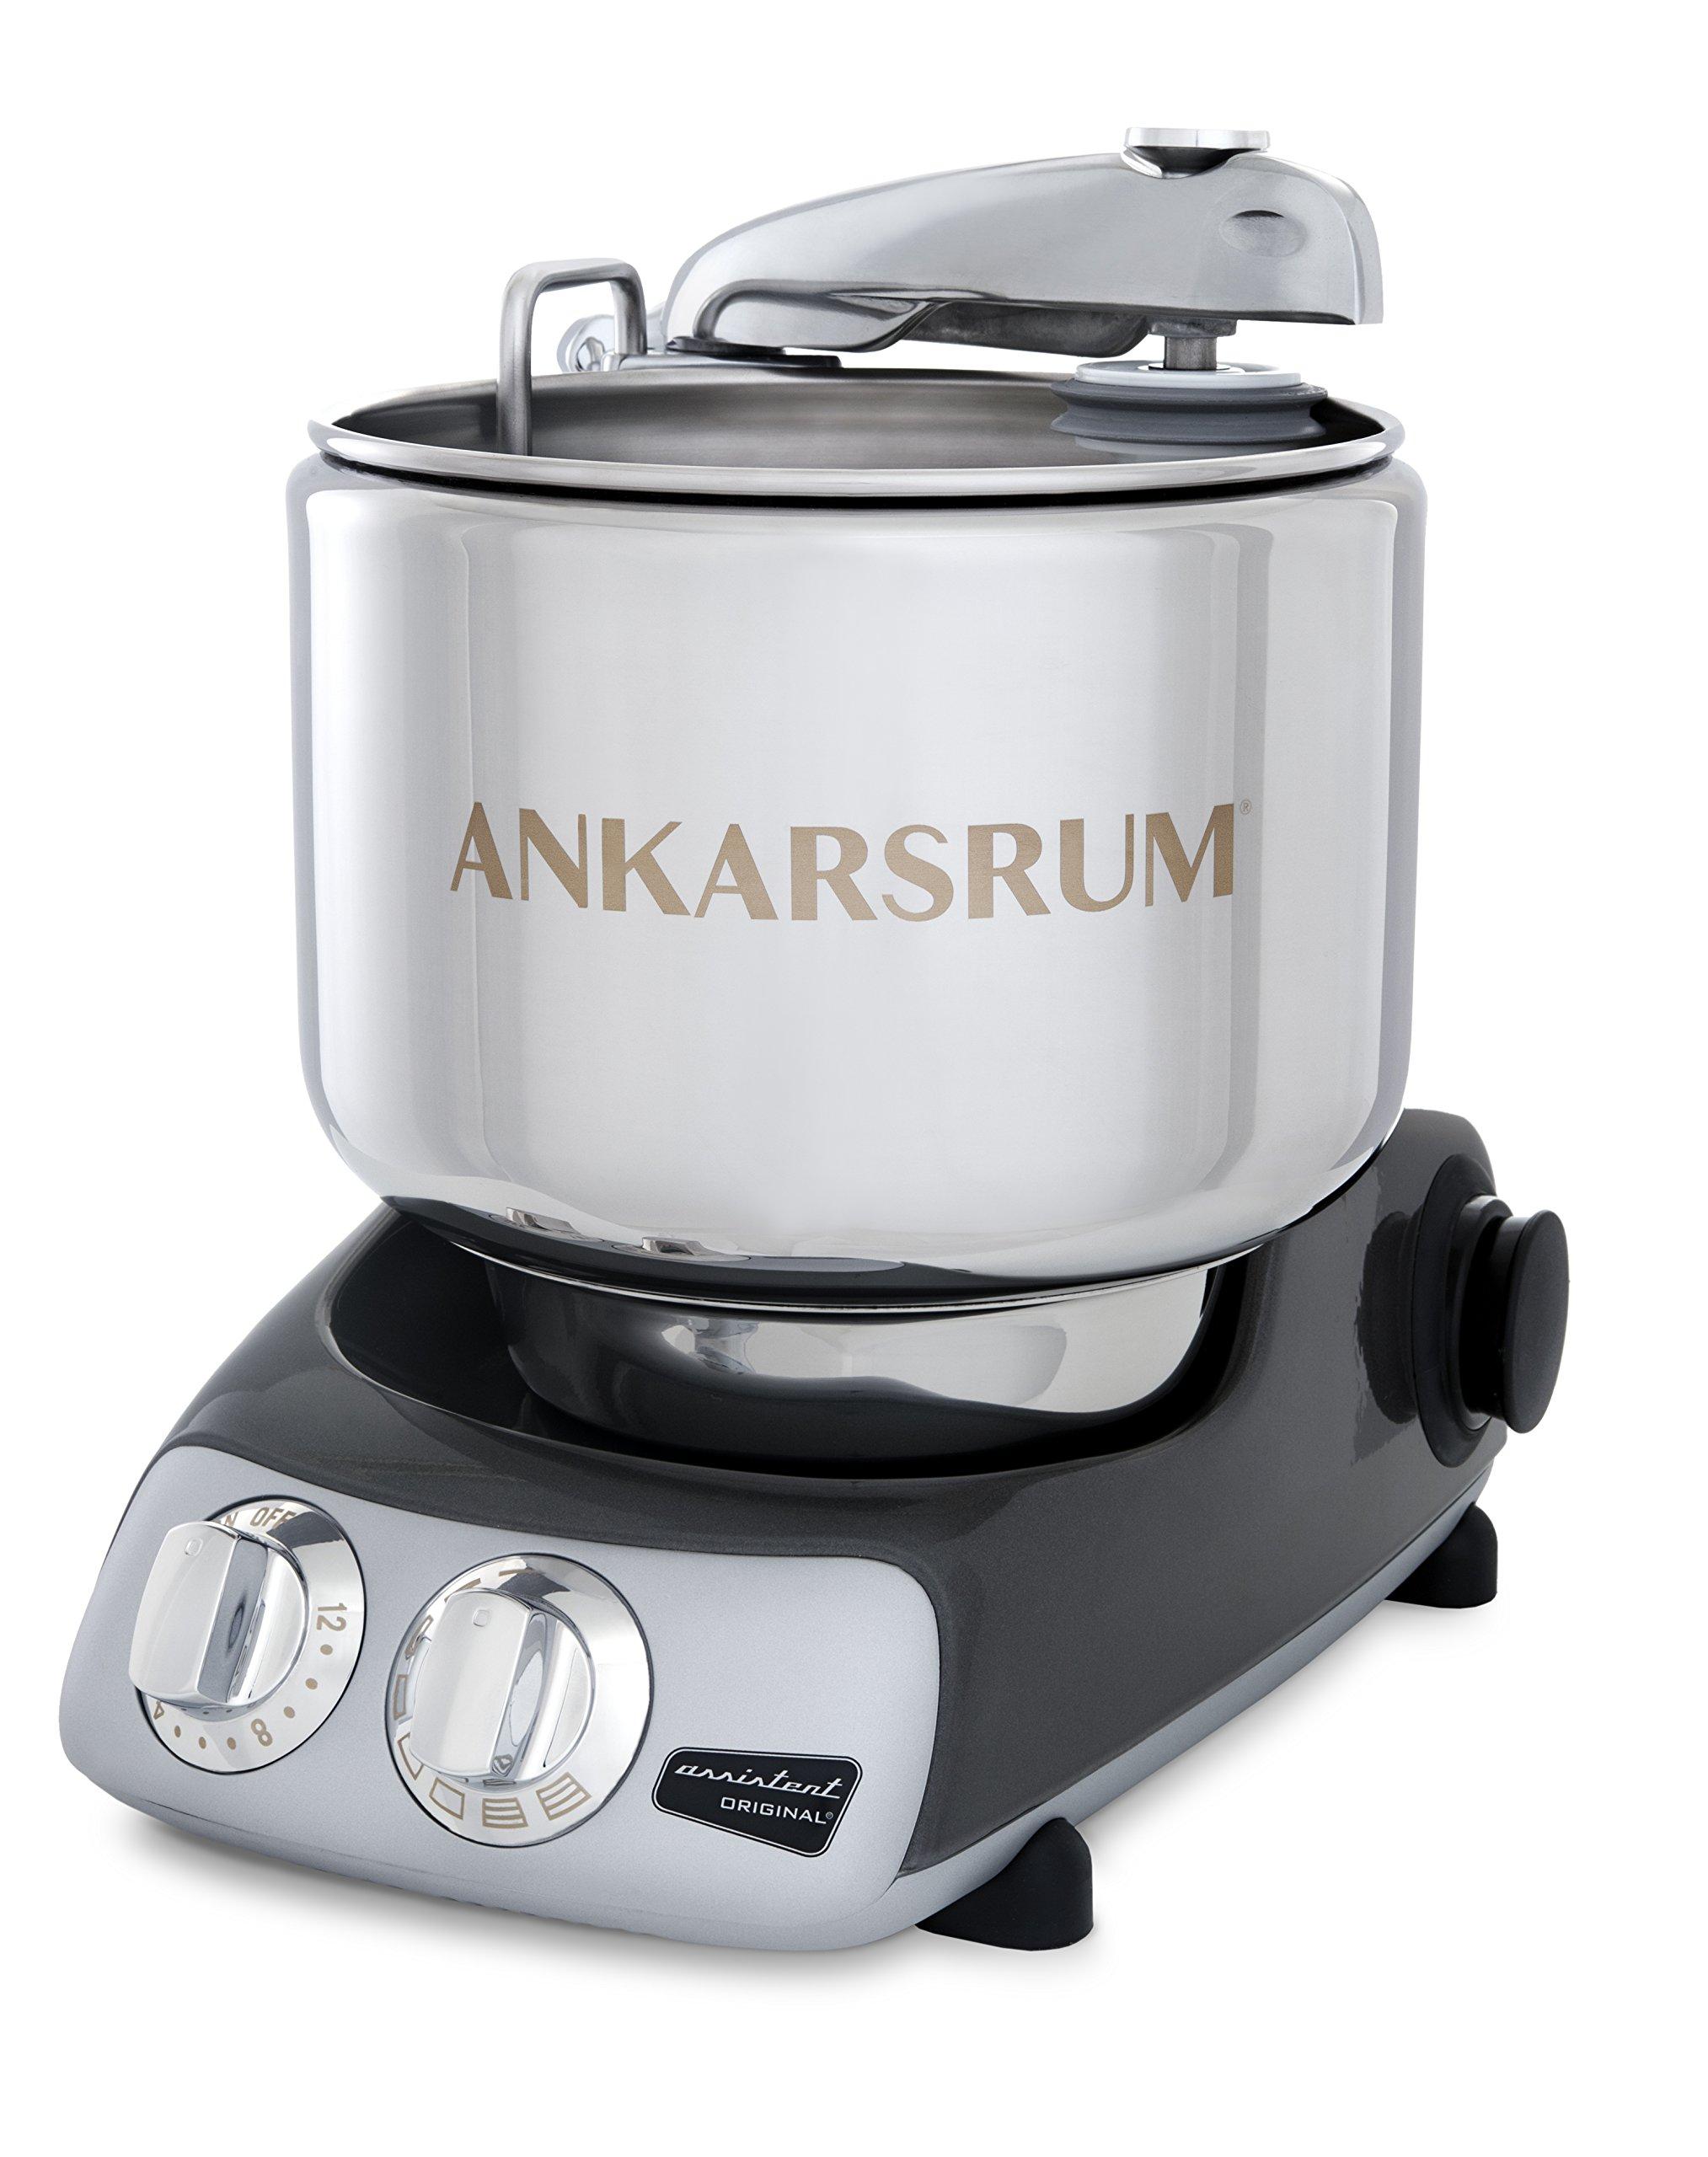 Ankarsrum AKM 6230 Electric Stand Mixer